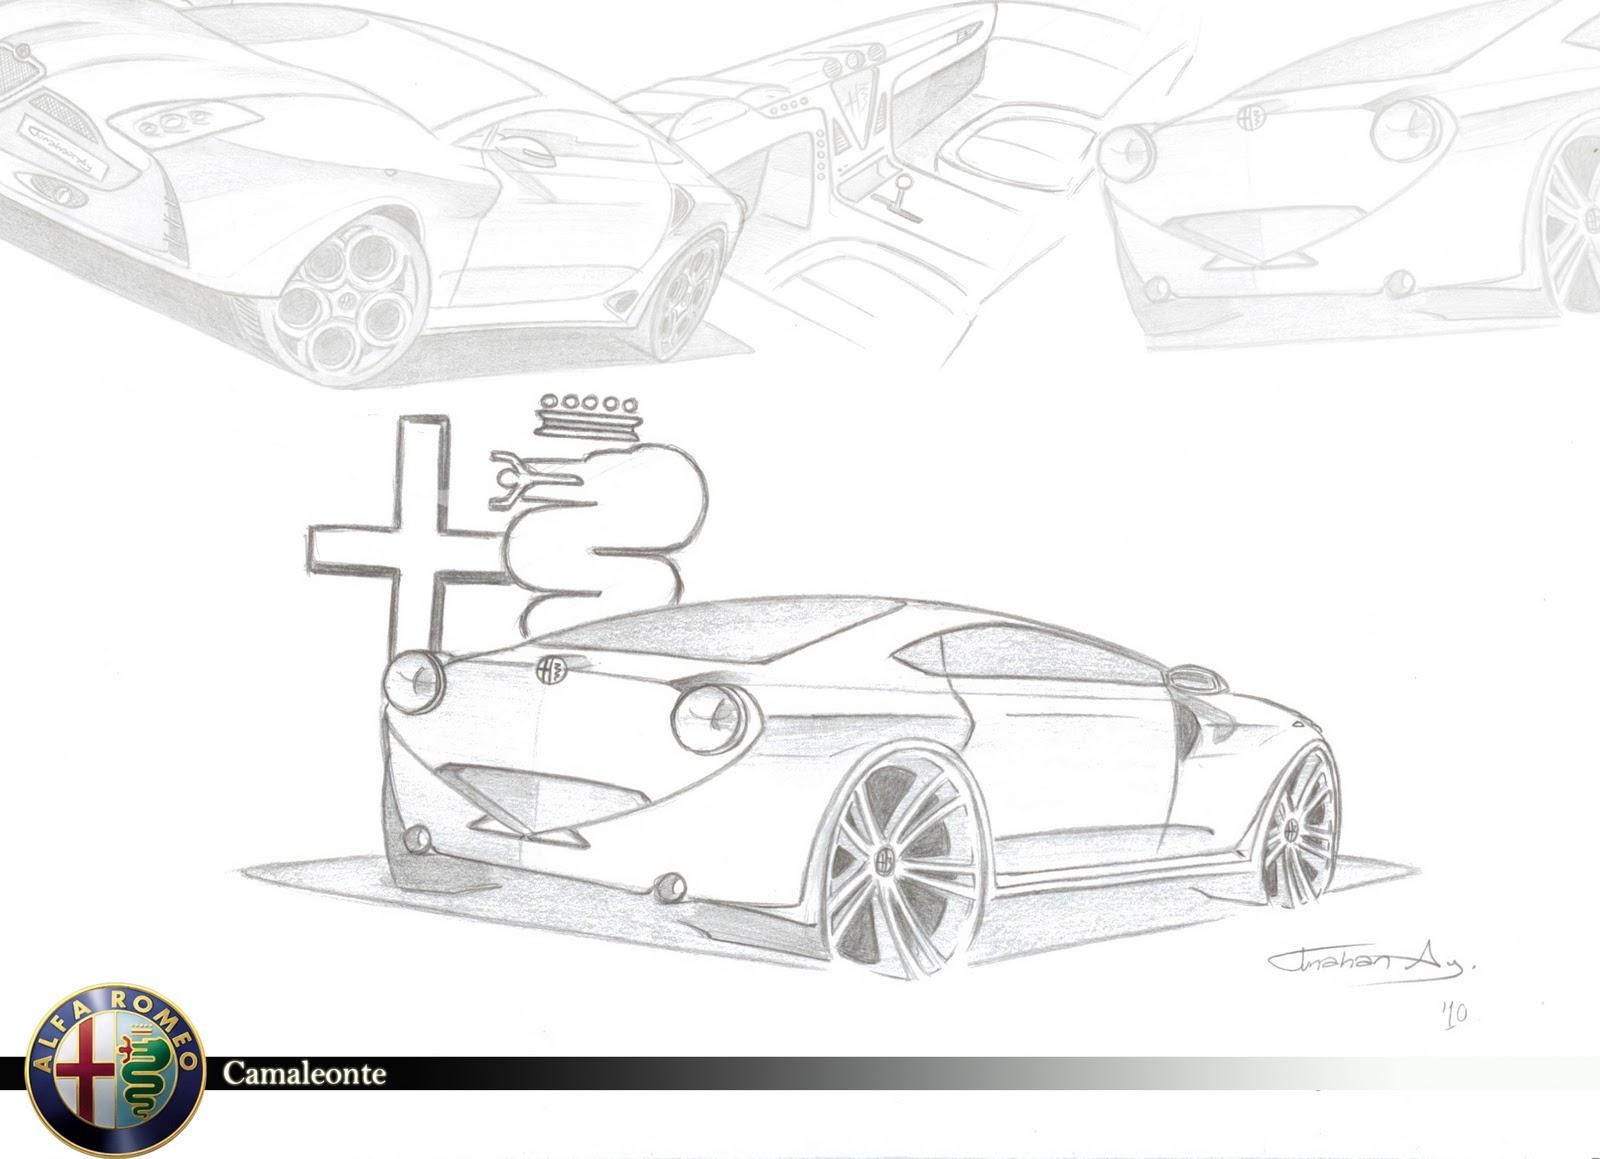 Tunahan Ay Design Blog: Alfa Romeo Camaleonte